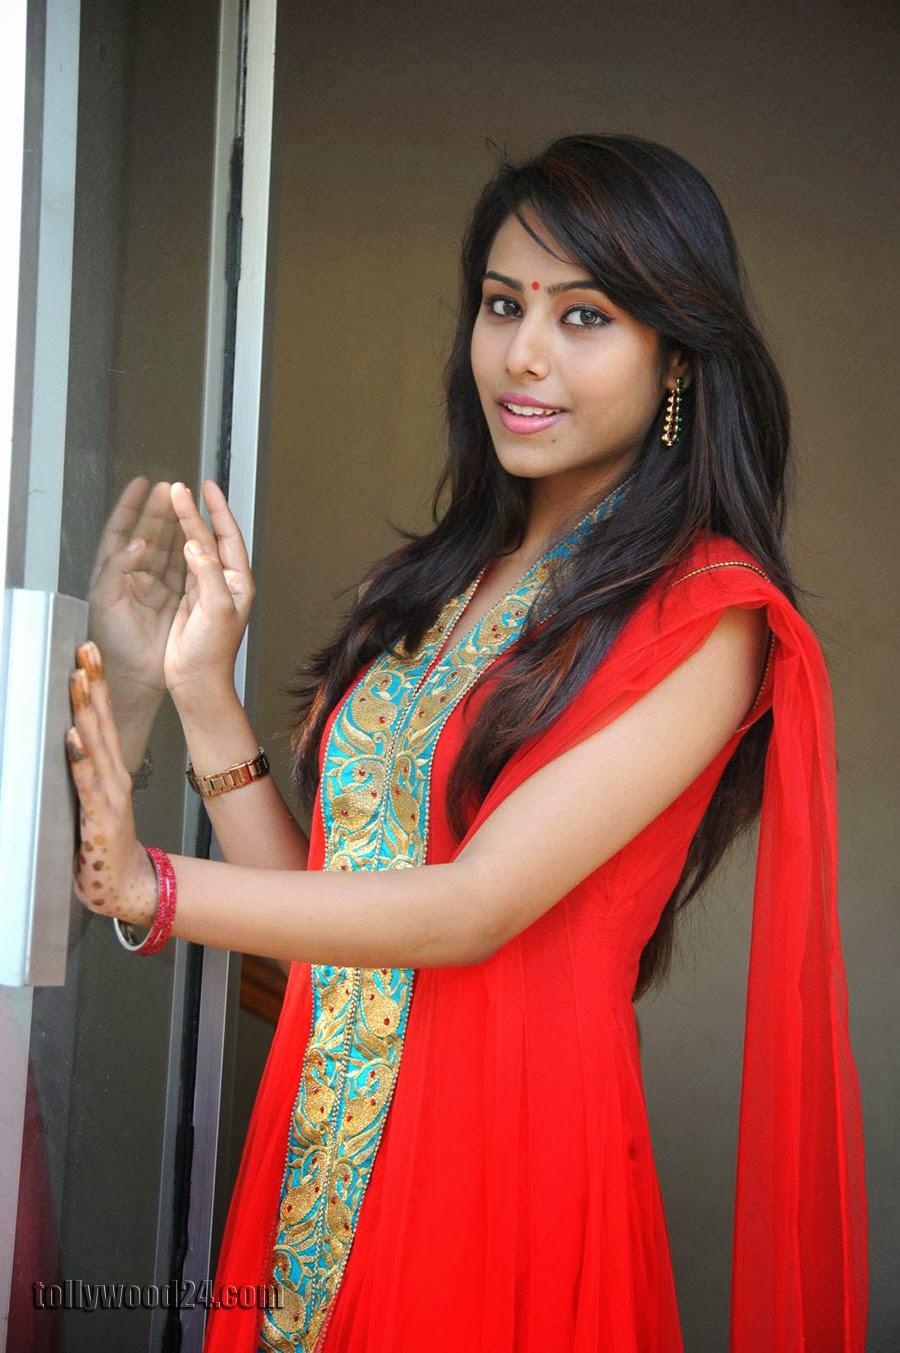 Beautiful Khenisha Chandran Photos Gallery-HQ-Photo-19